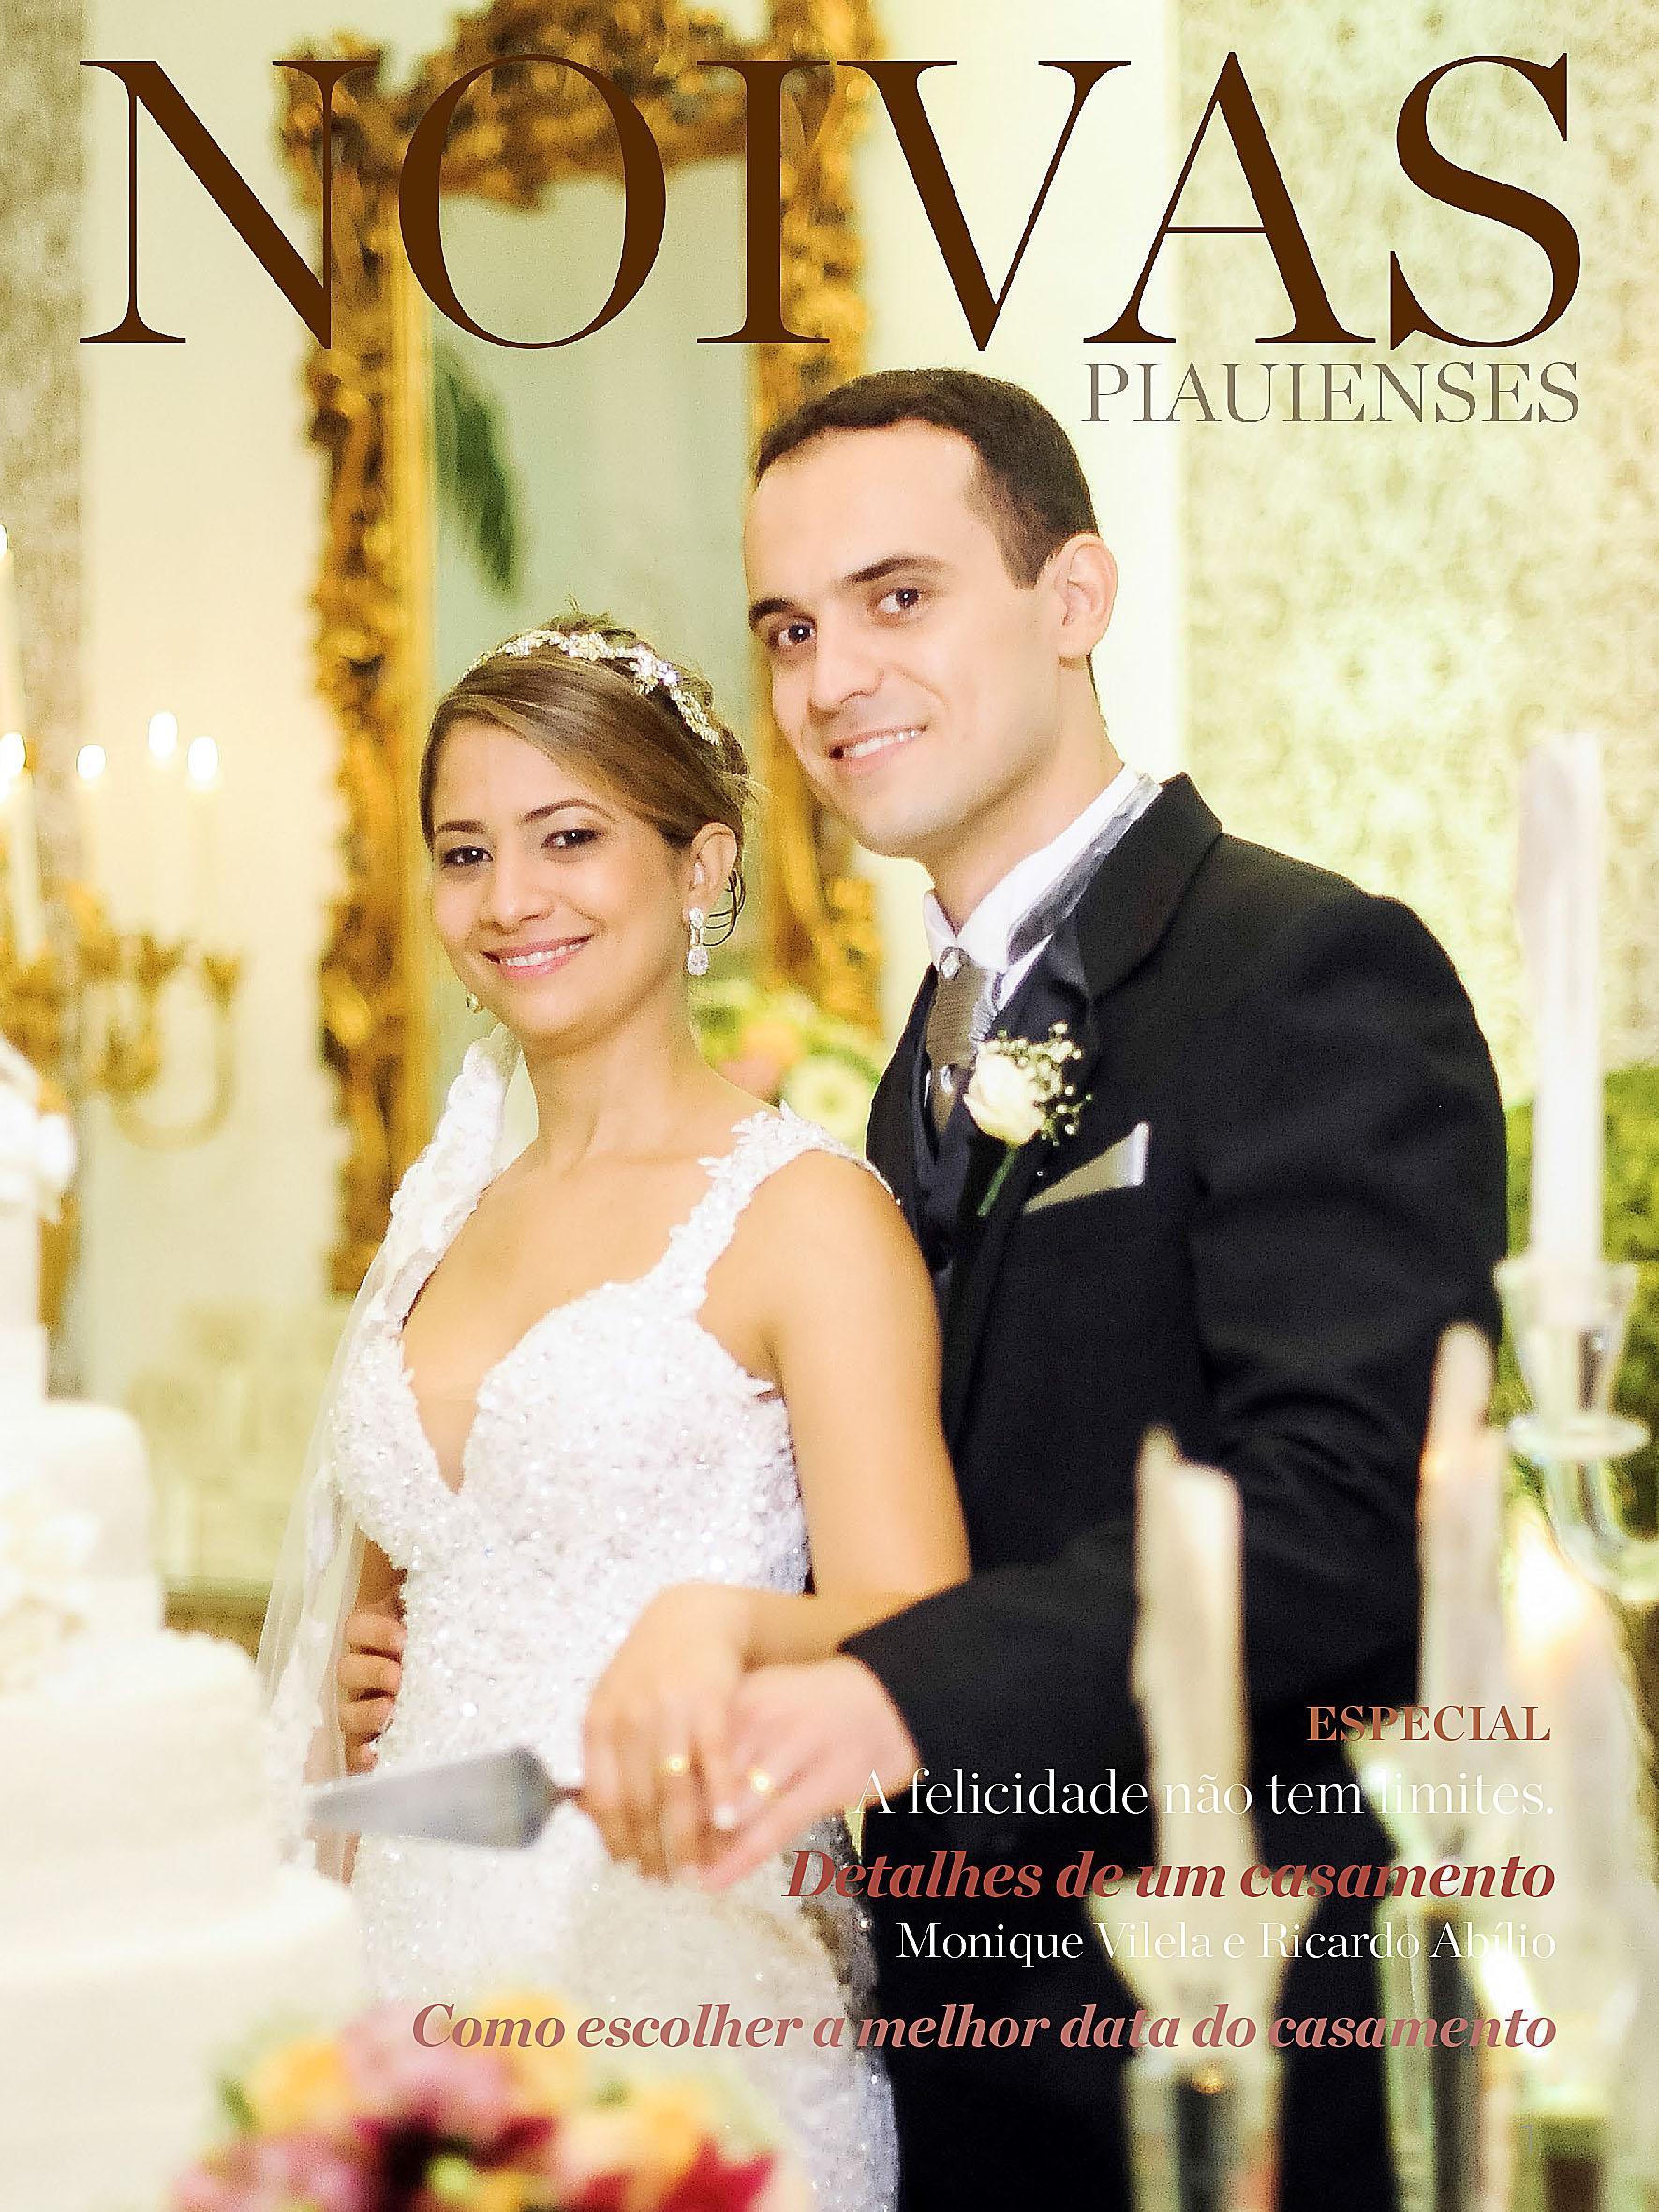 Revista Noivas Piauienses - Ed. 5